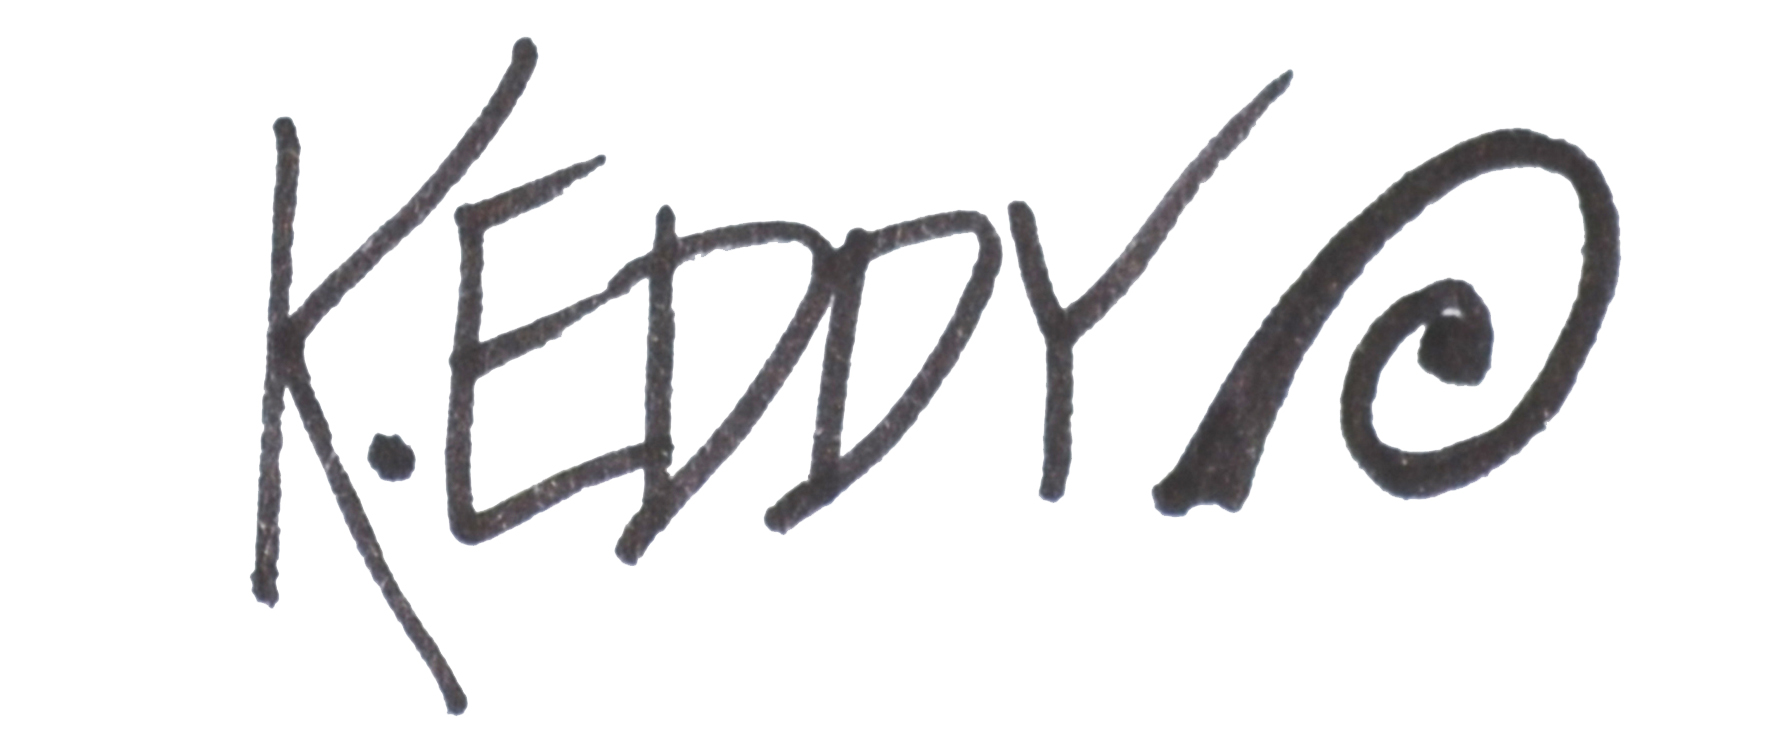 Kimberley Eddy Signature